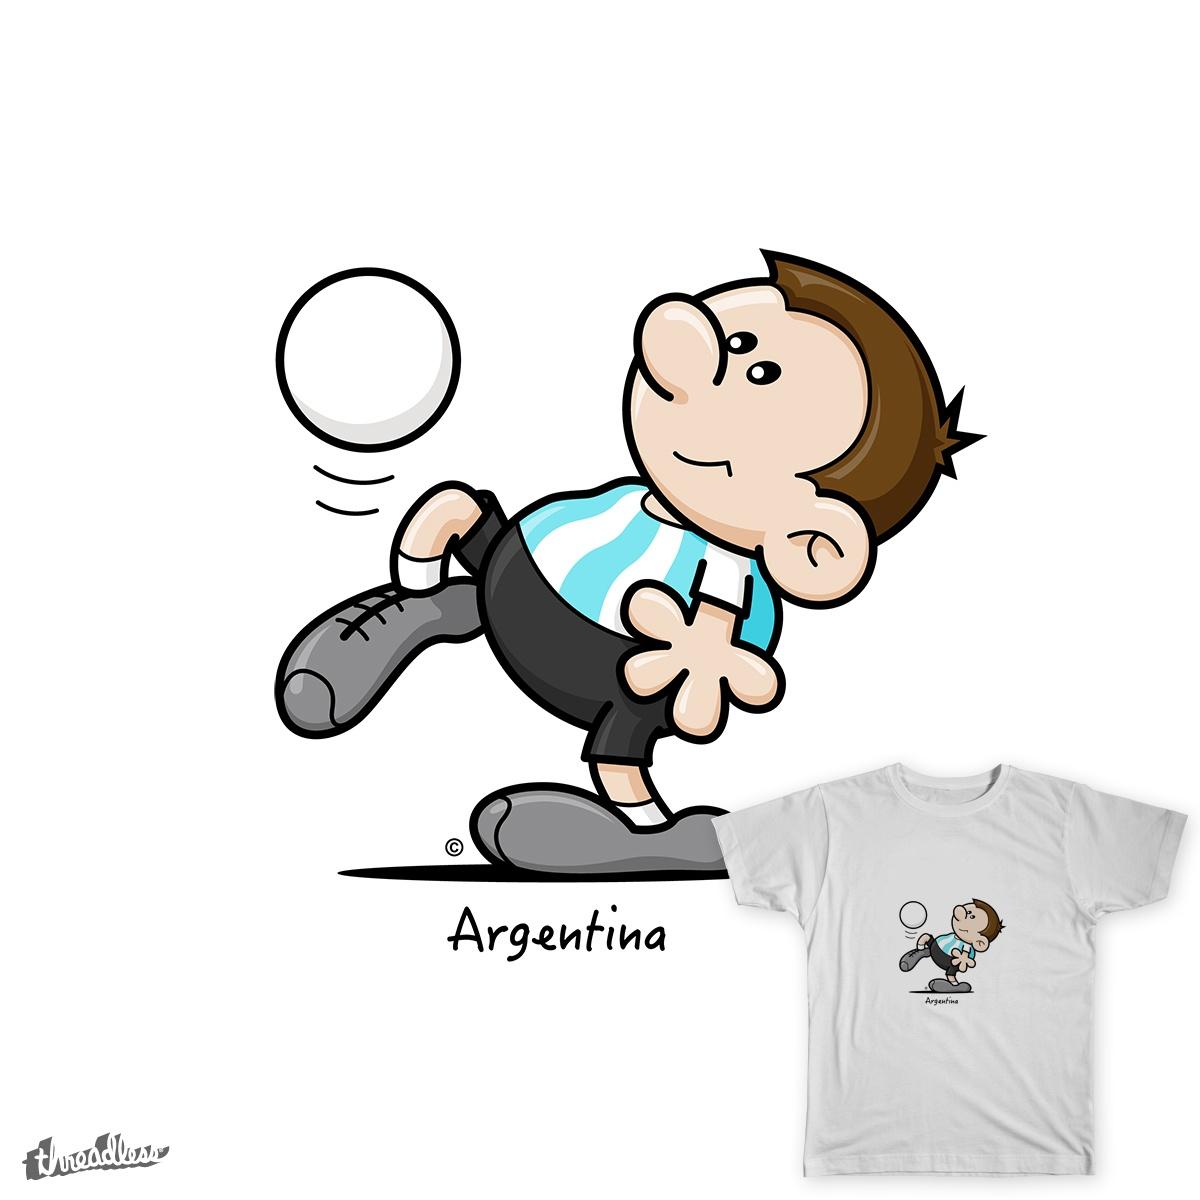 2014 World Cup Cartoons - Argentina by spaghettiarts on Threadless